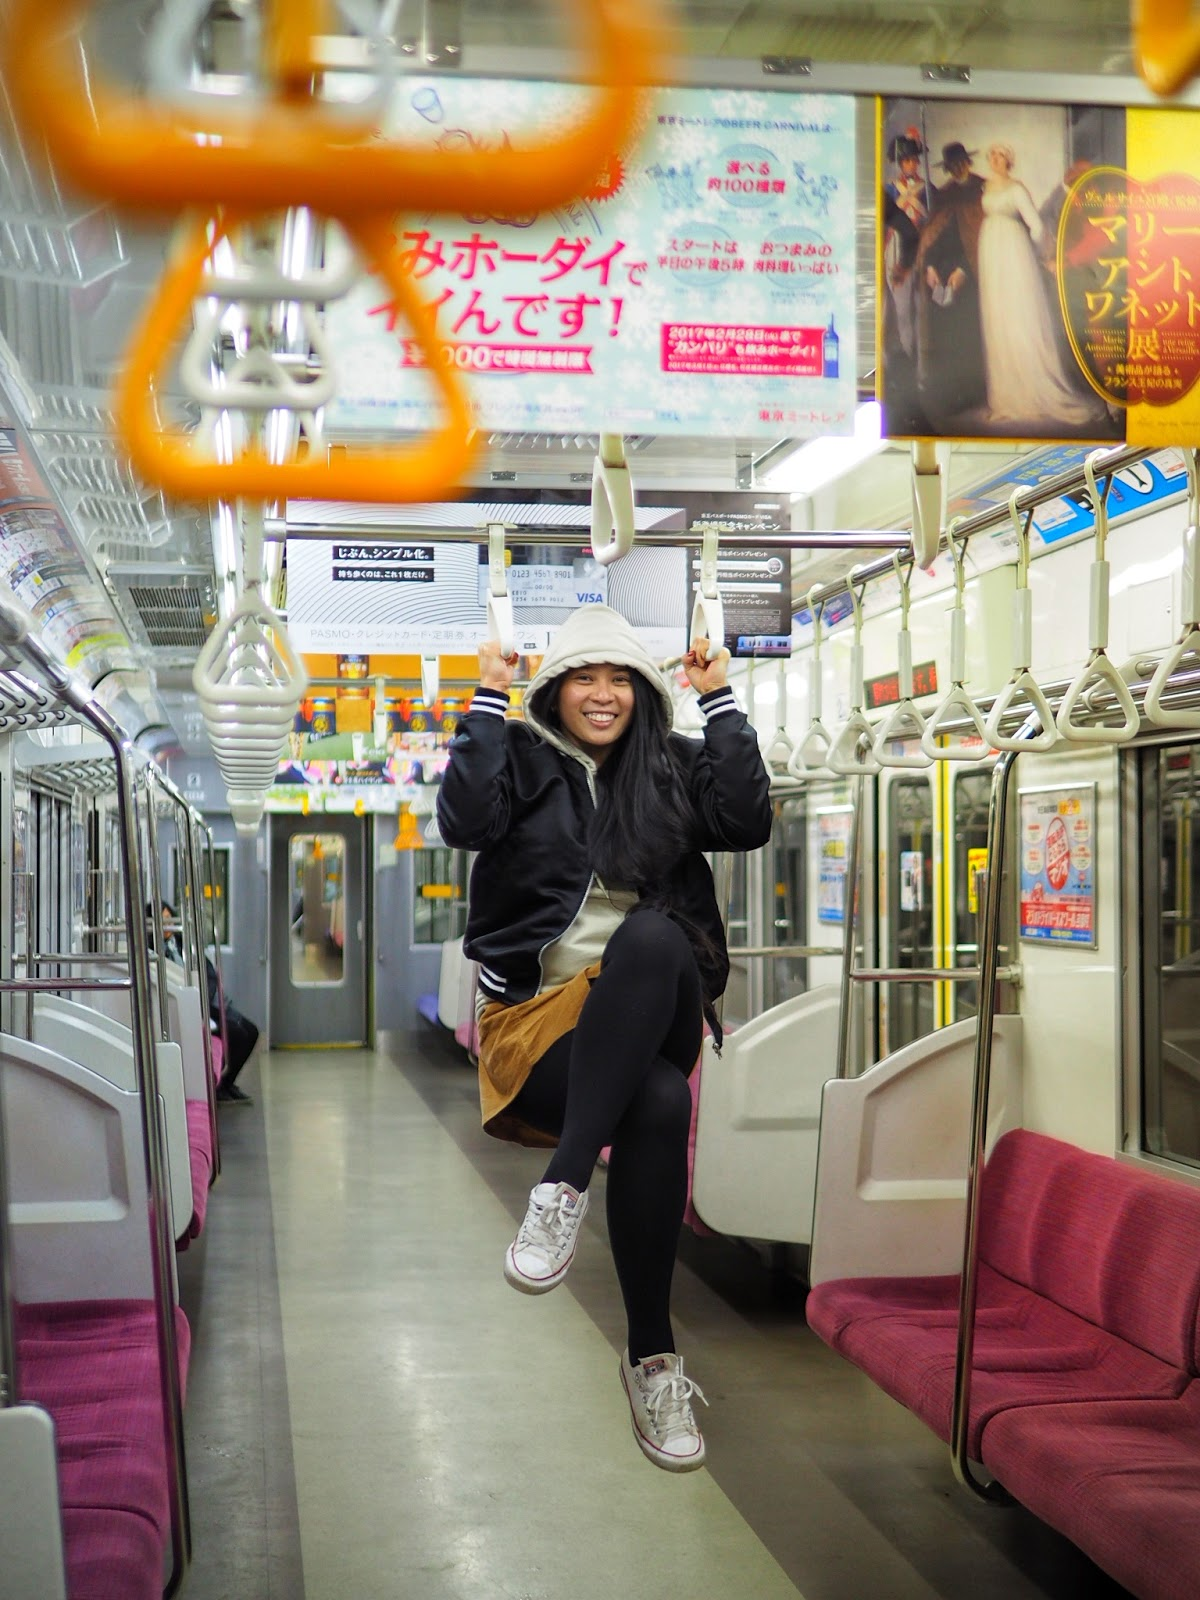 JR line tokyo nintendo skirt ootd ice cream purse N64